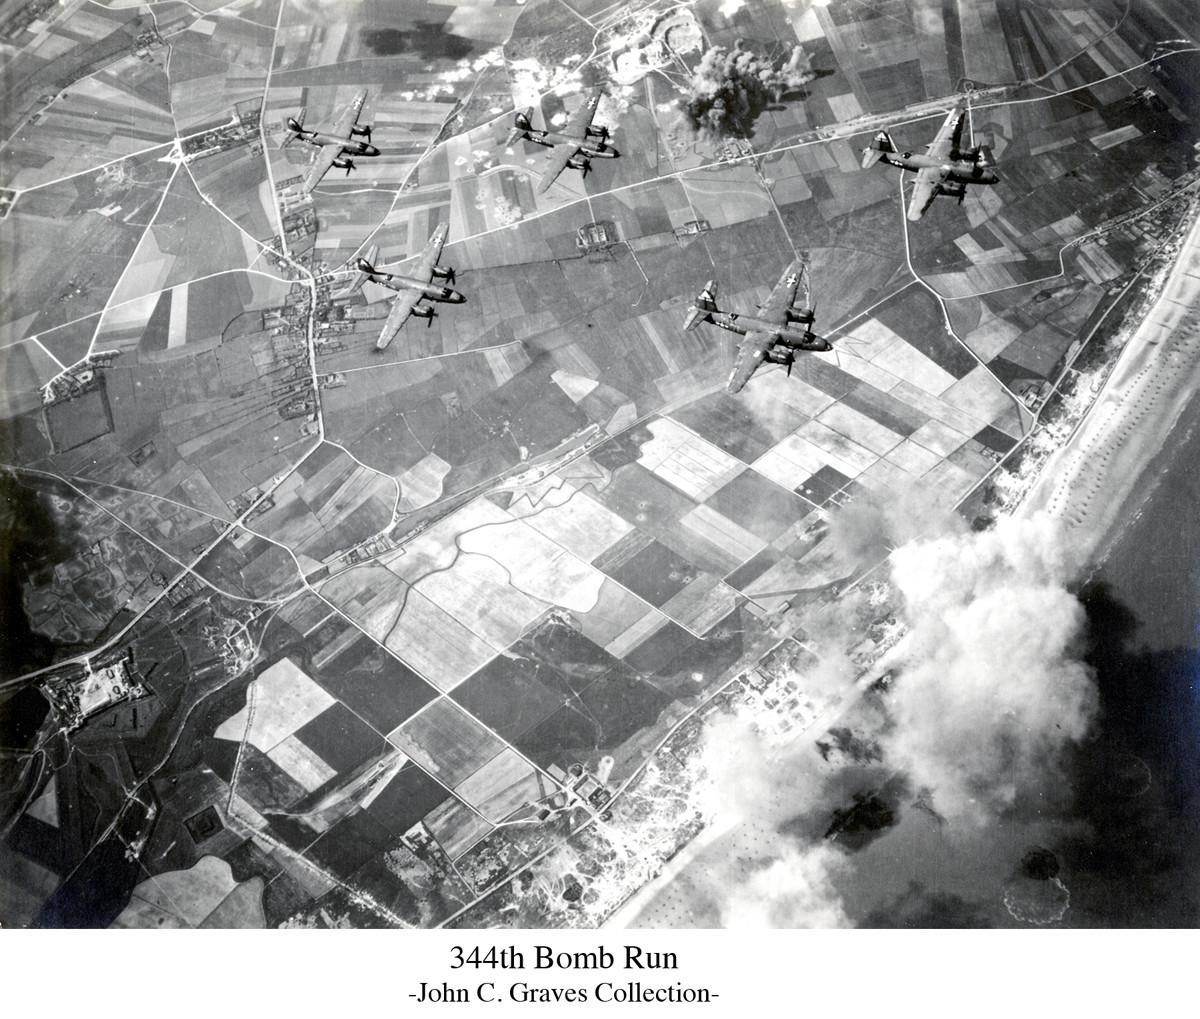 John C Graves bombing run copy